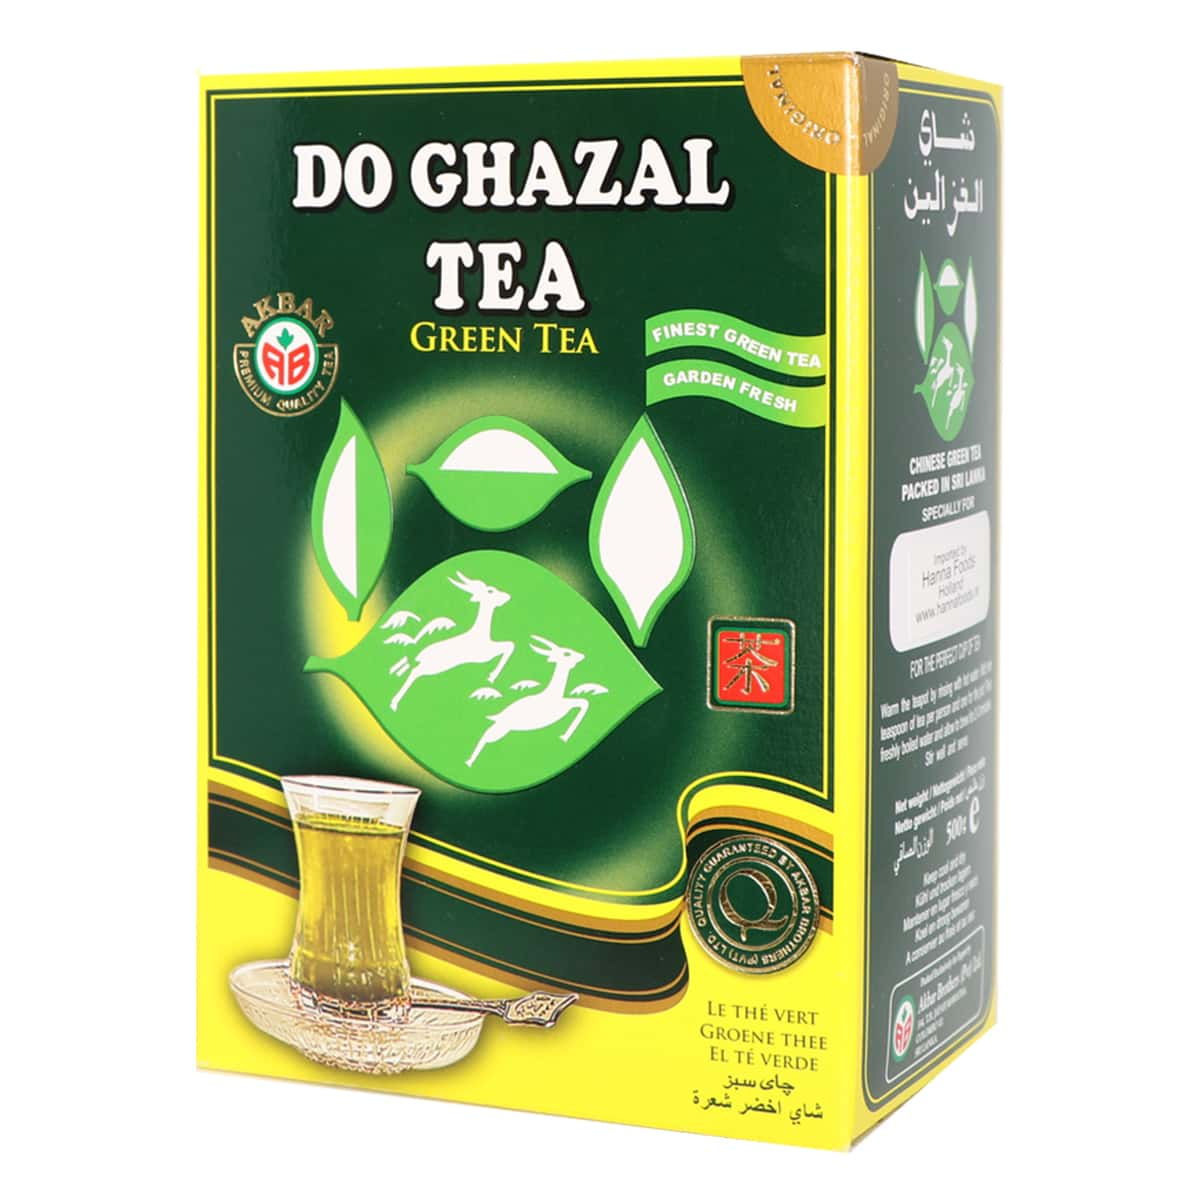 Buy Alghazaleen Tea (Do Ghazal Tea) Green Tea (Loose Tea) - 500 gm